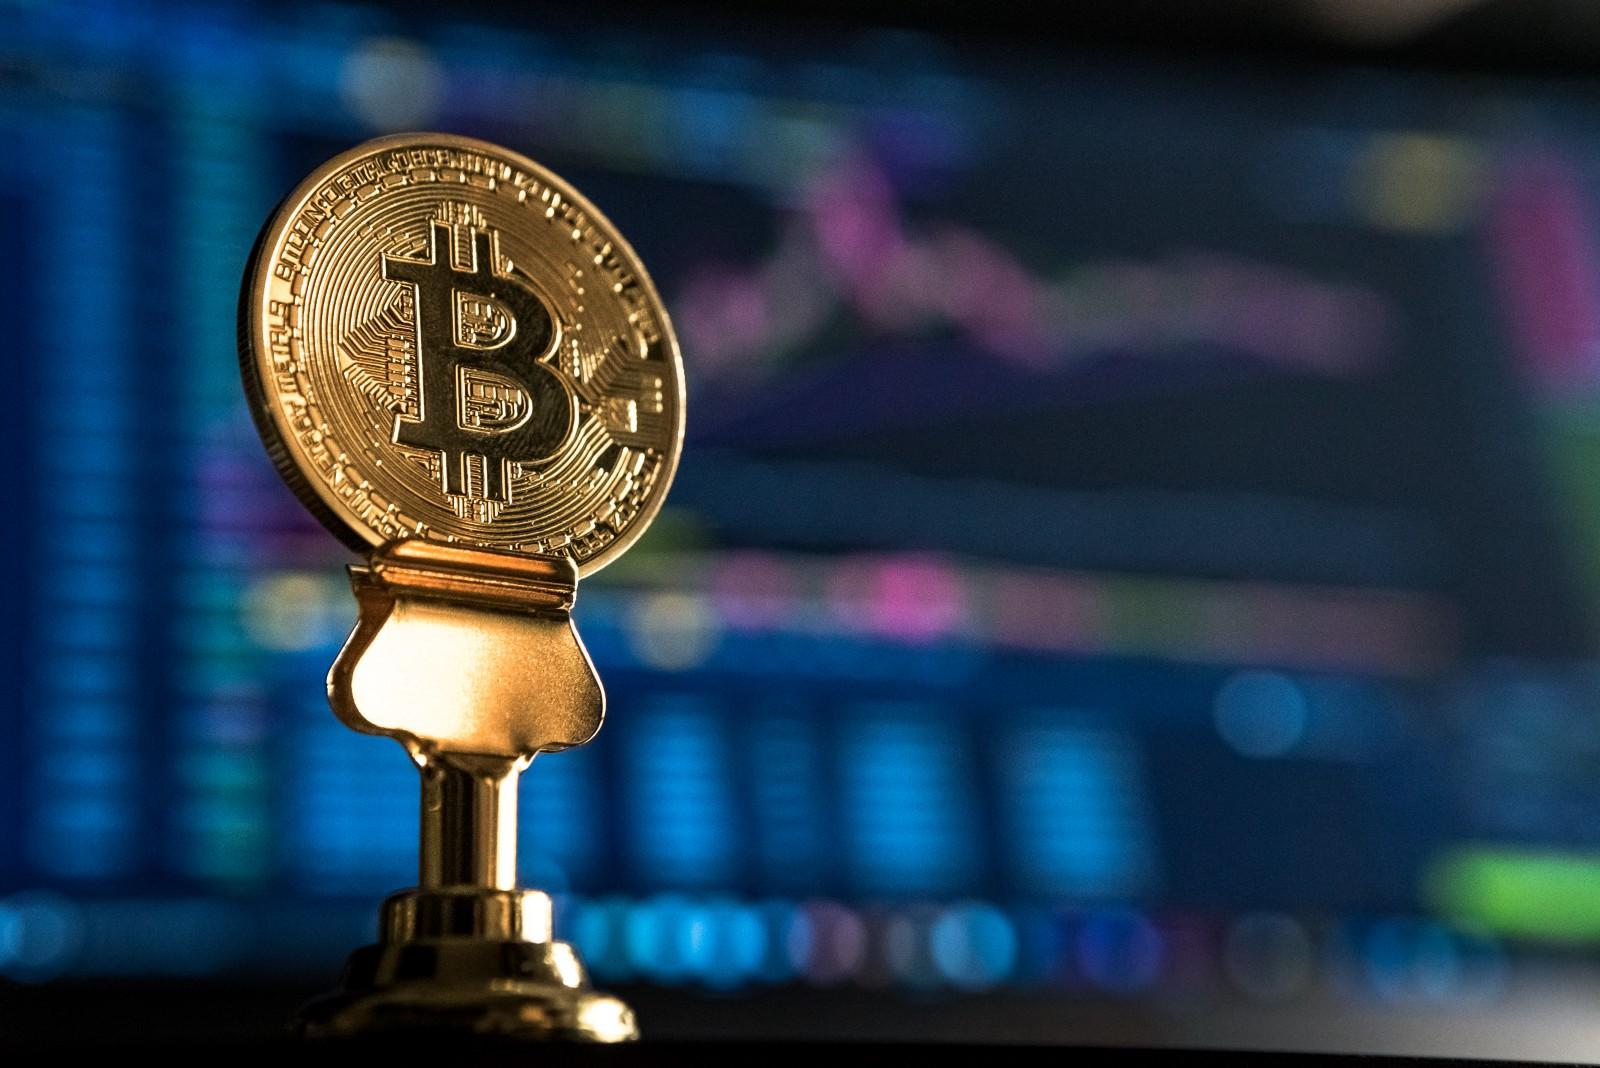 /bitcoin-crypto-trading-fx-brokers-comeback-16ba516263b9 feature image